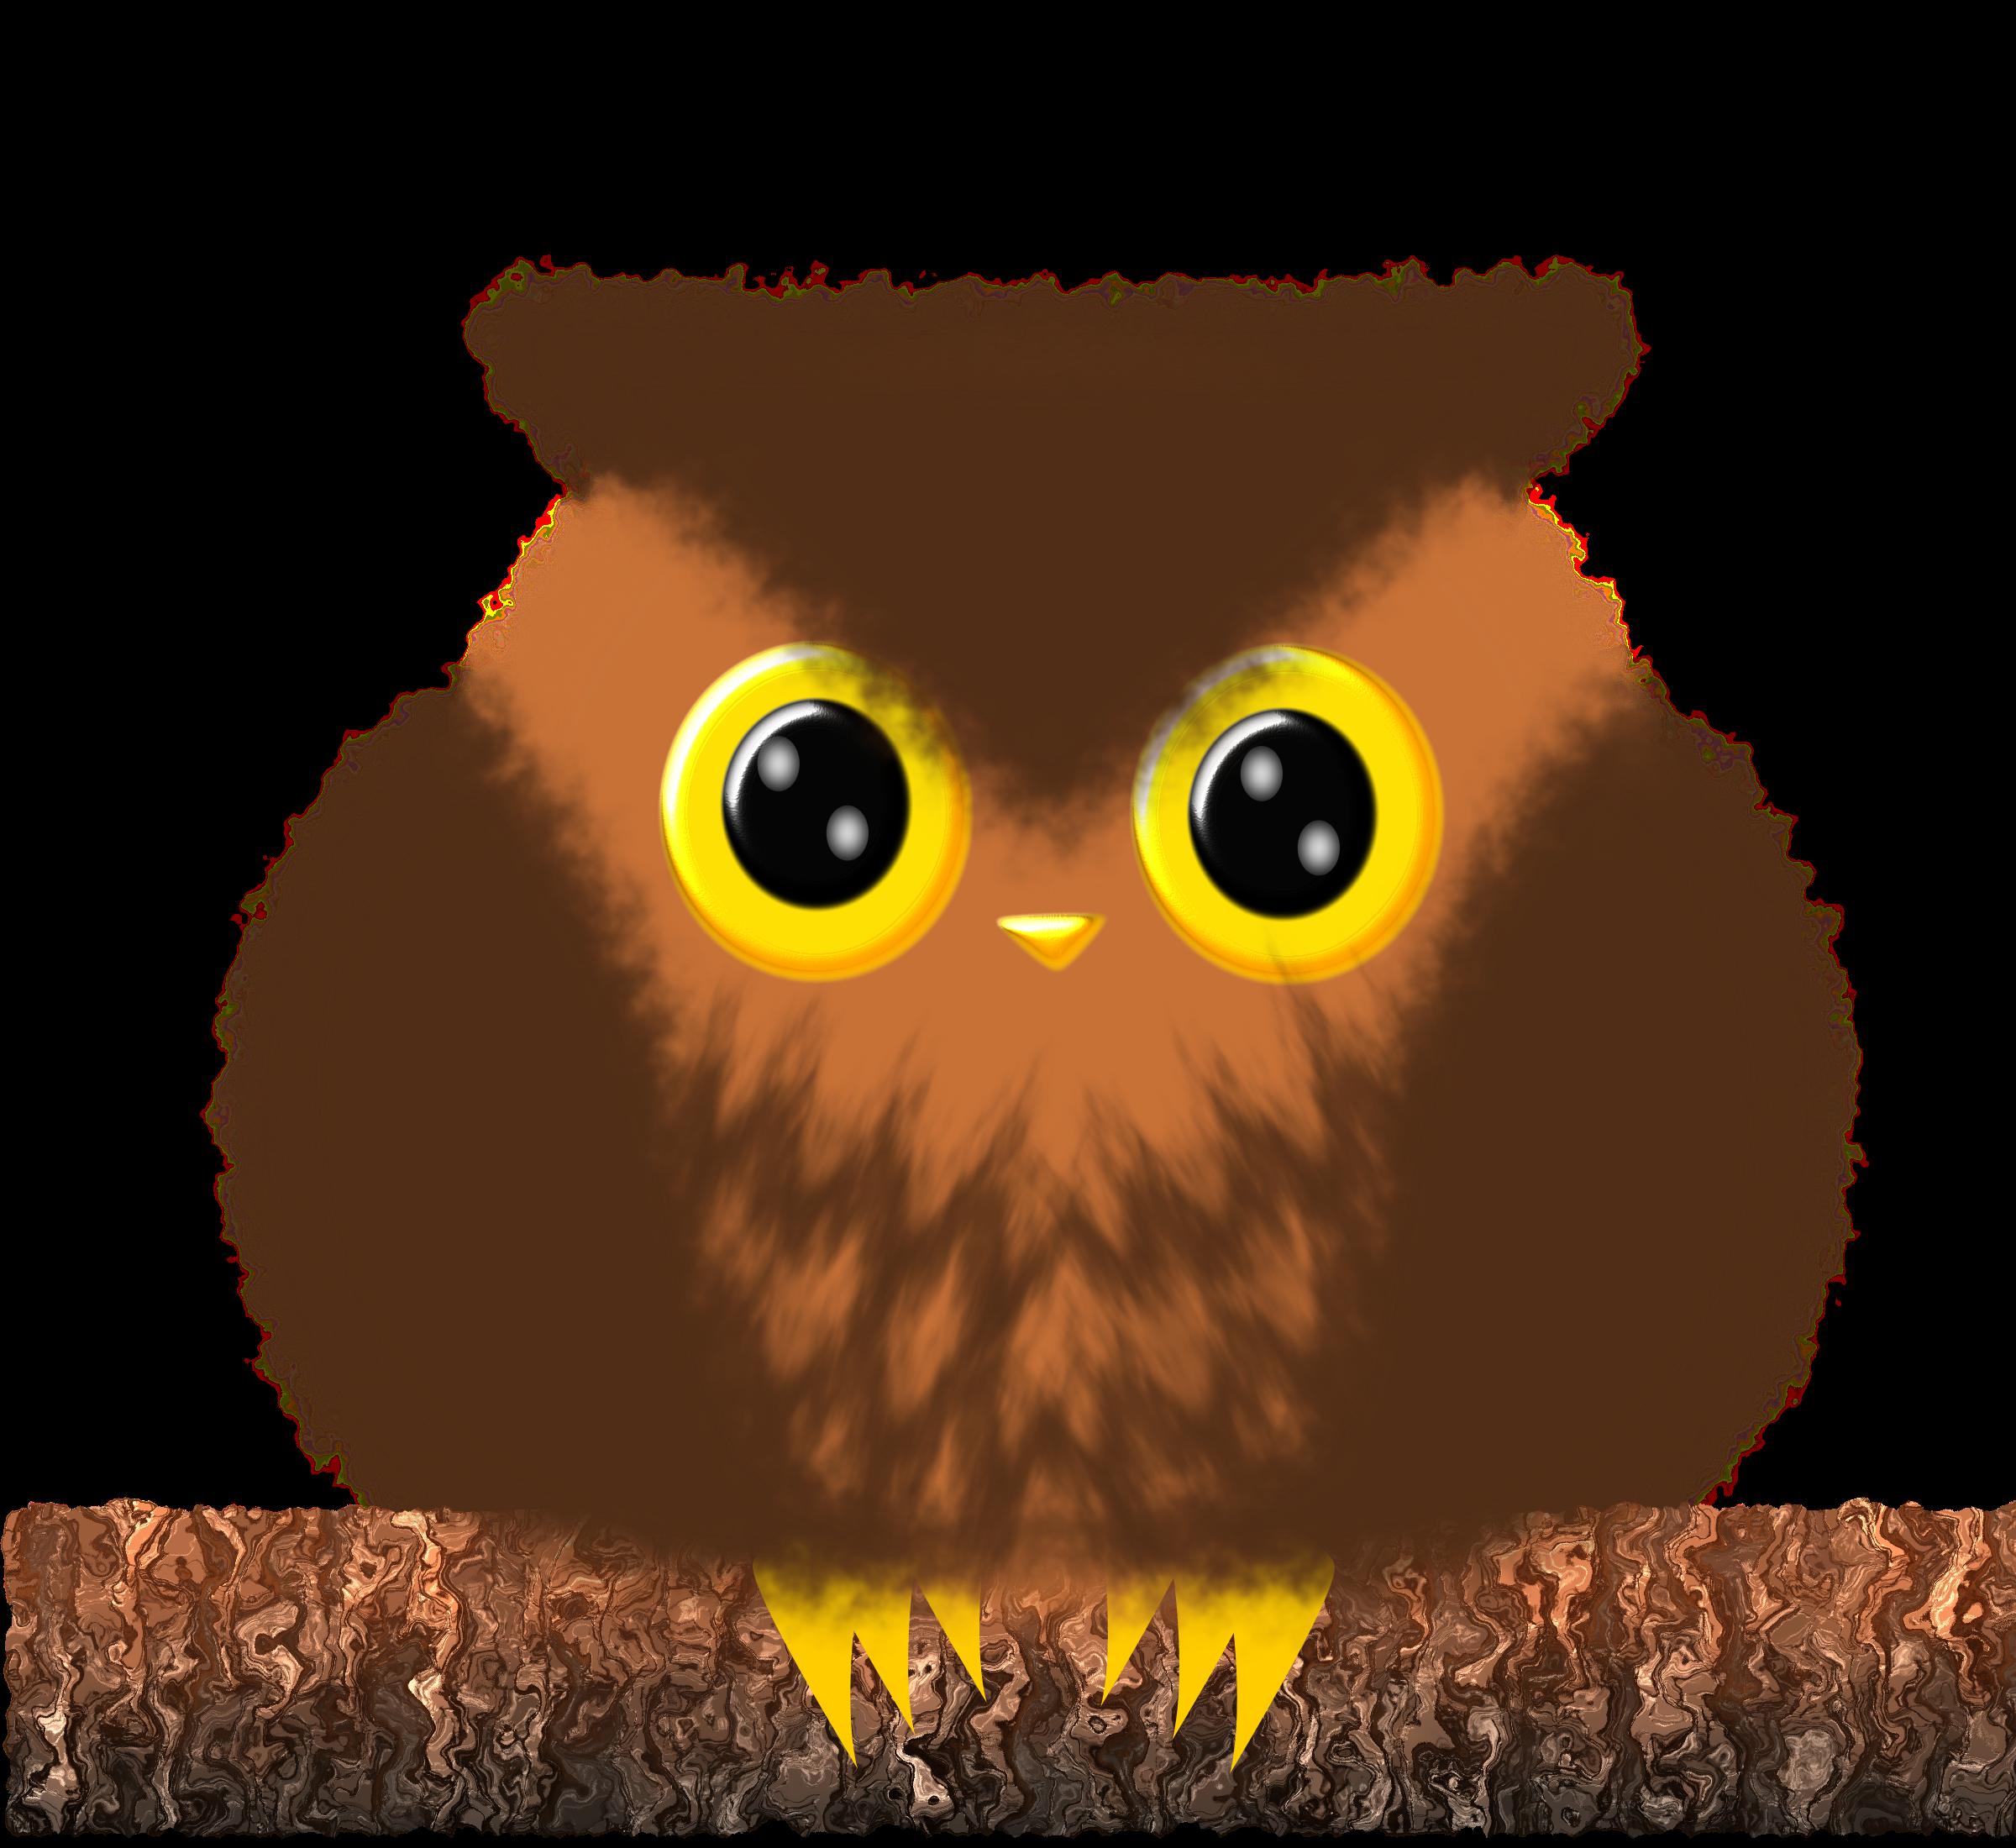 Owlet clipart brown Owlet Owlet Brown Clipart Brown